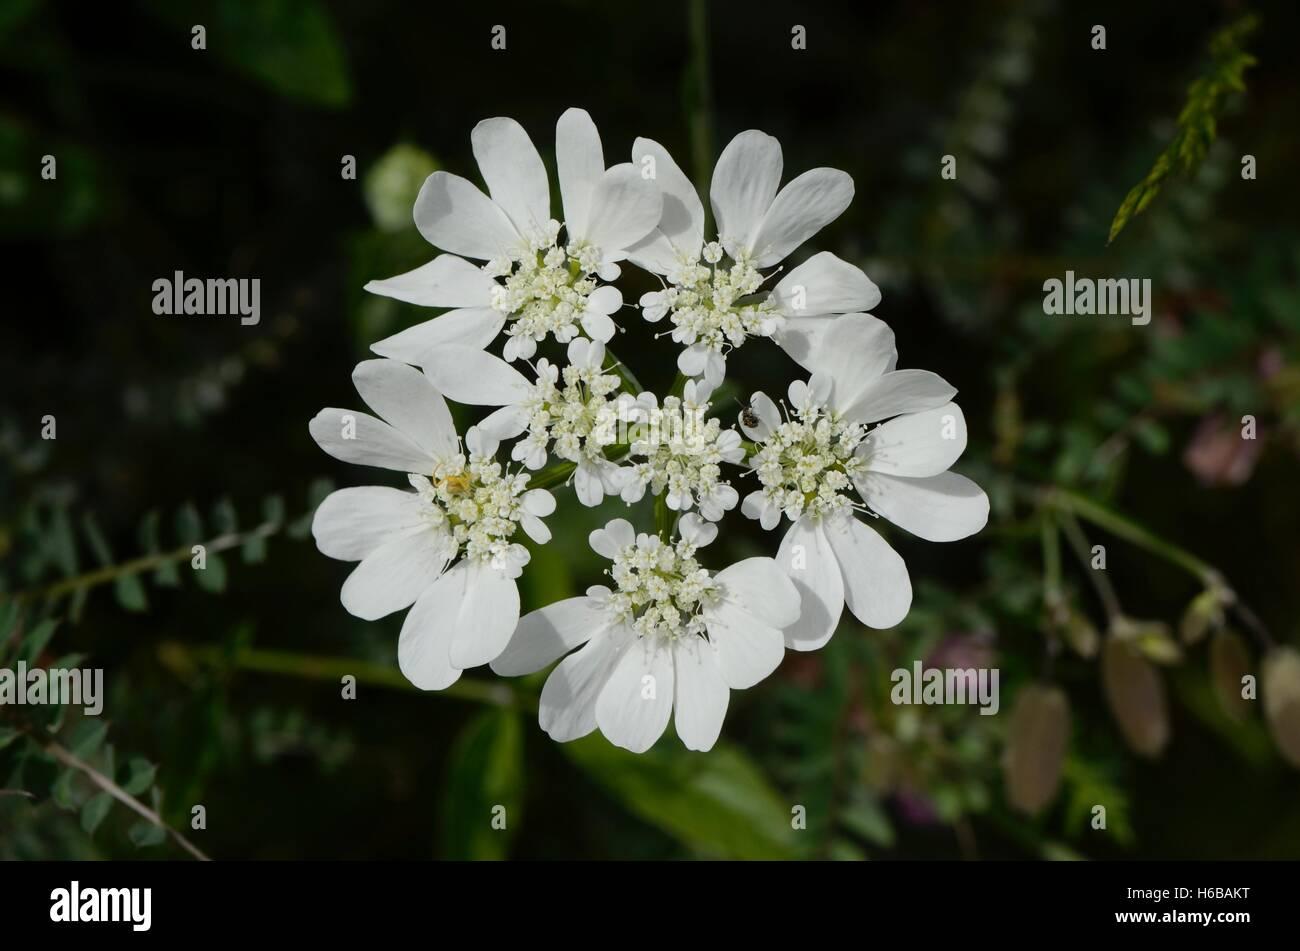 Orlaya (Orlaya grandiflora), Labeaume, Ardèche, France Stock Photo